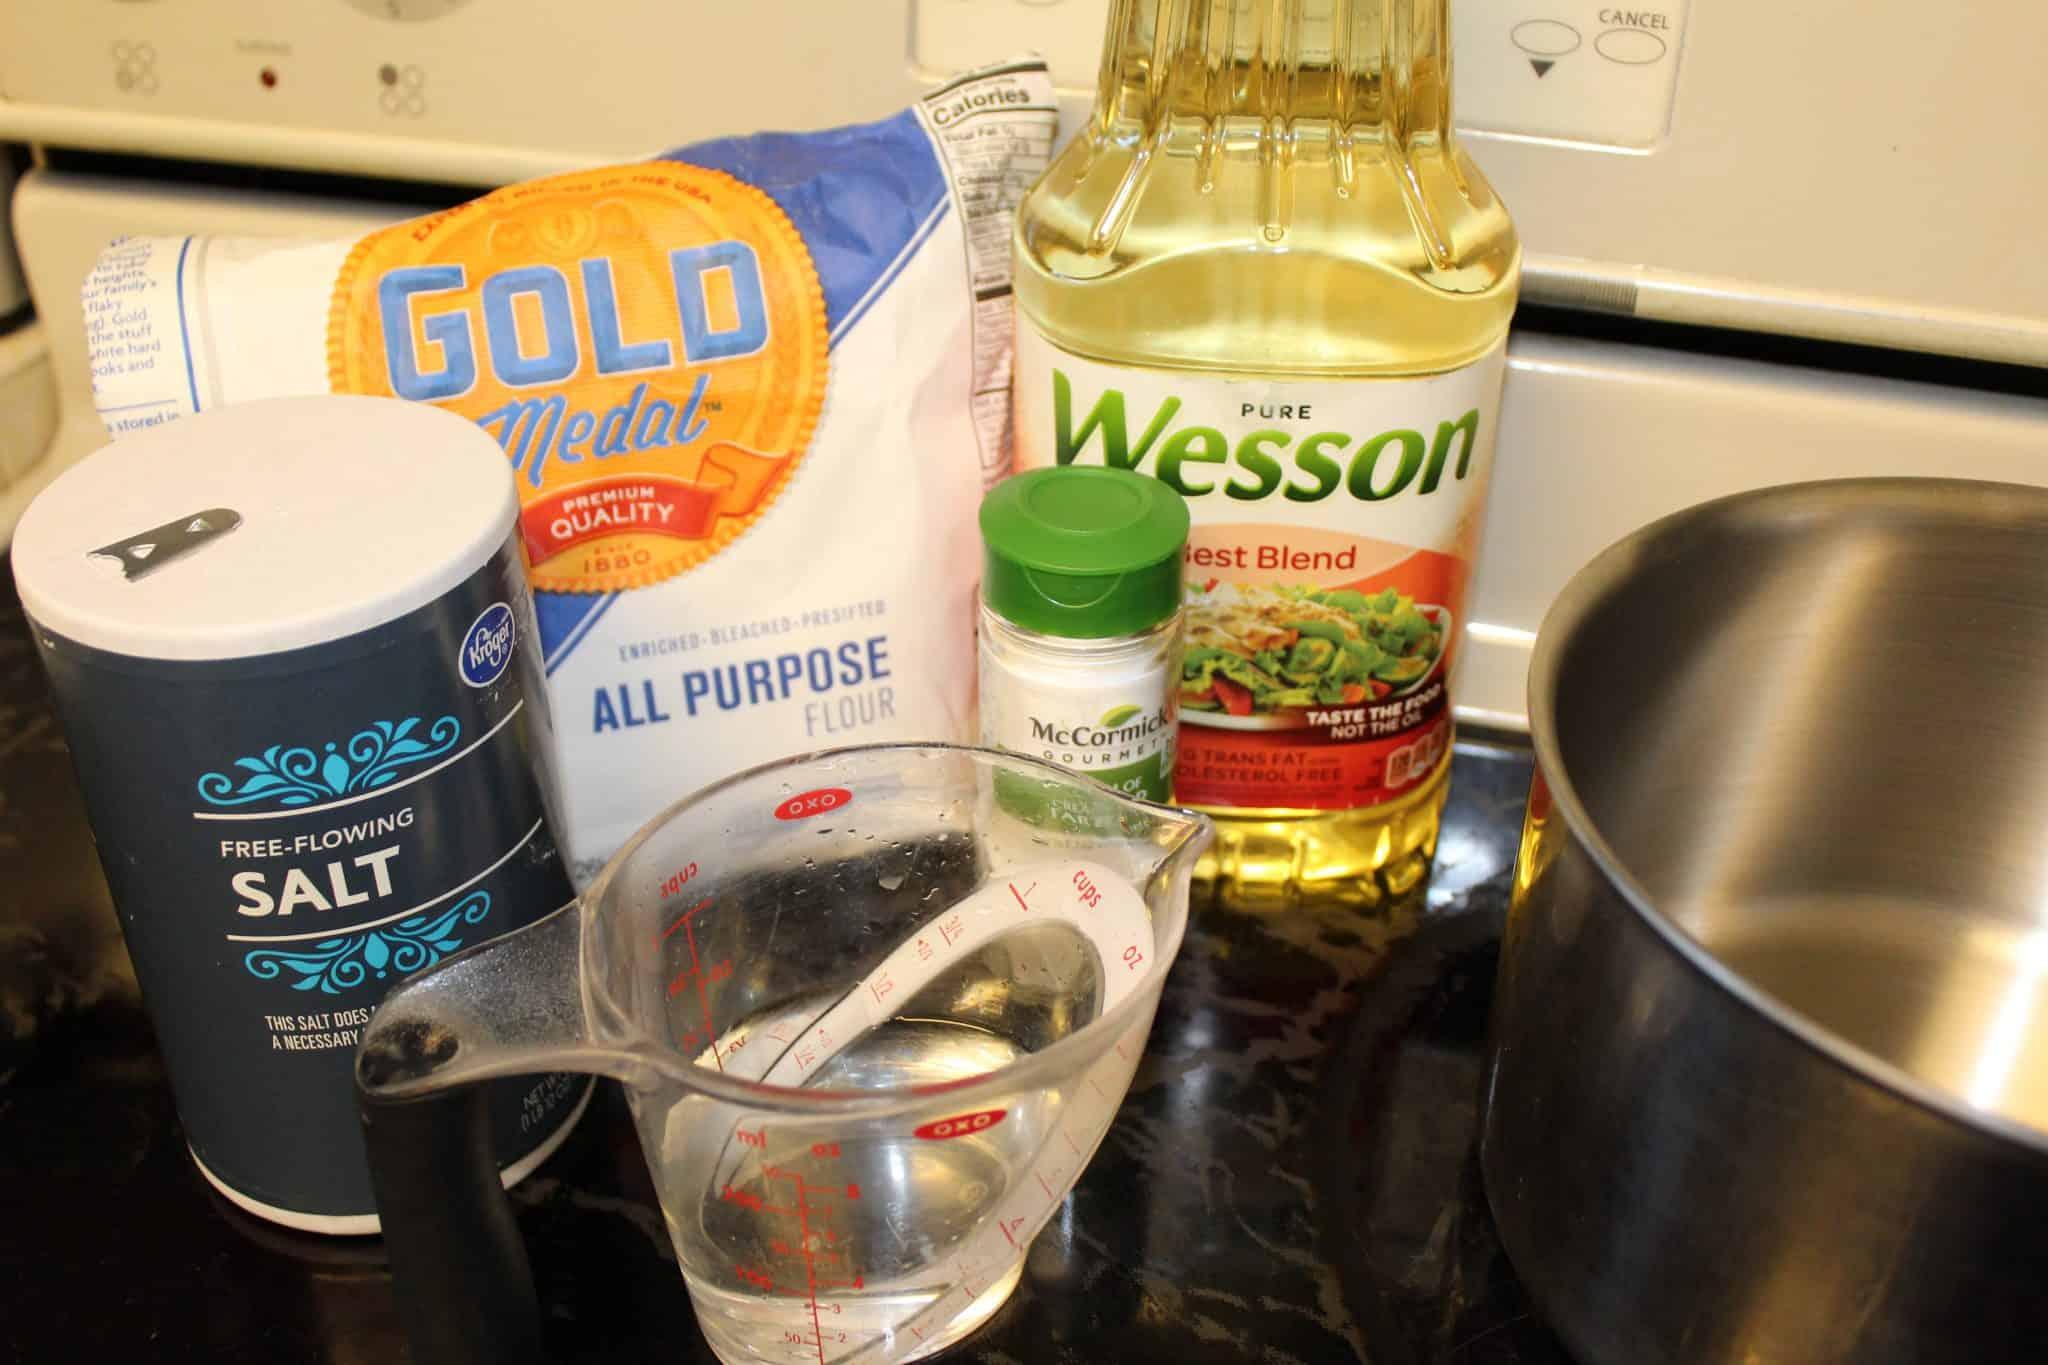 ingredients for homemade playdough recipe